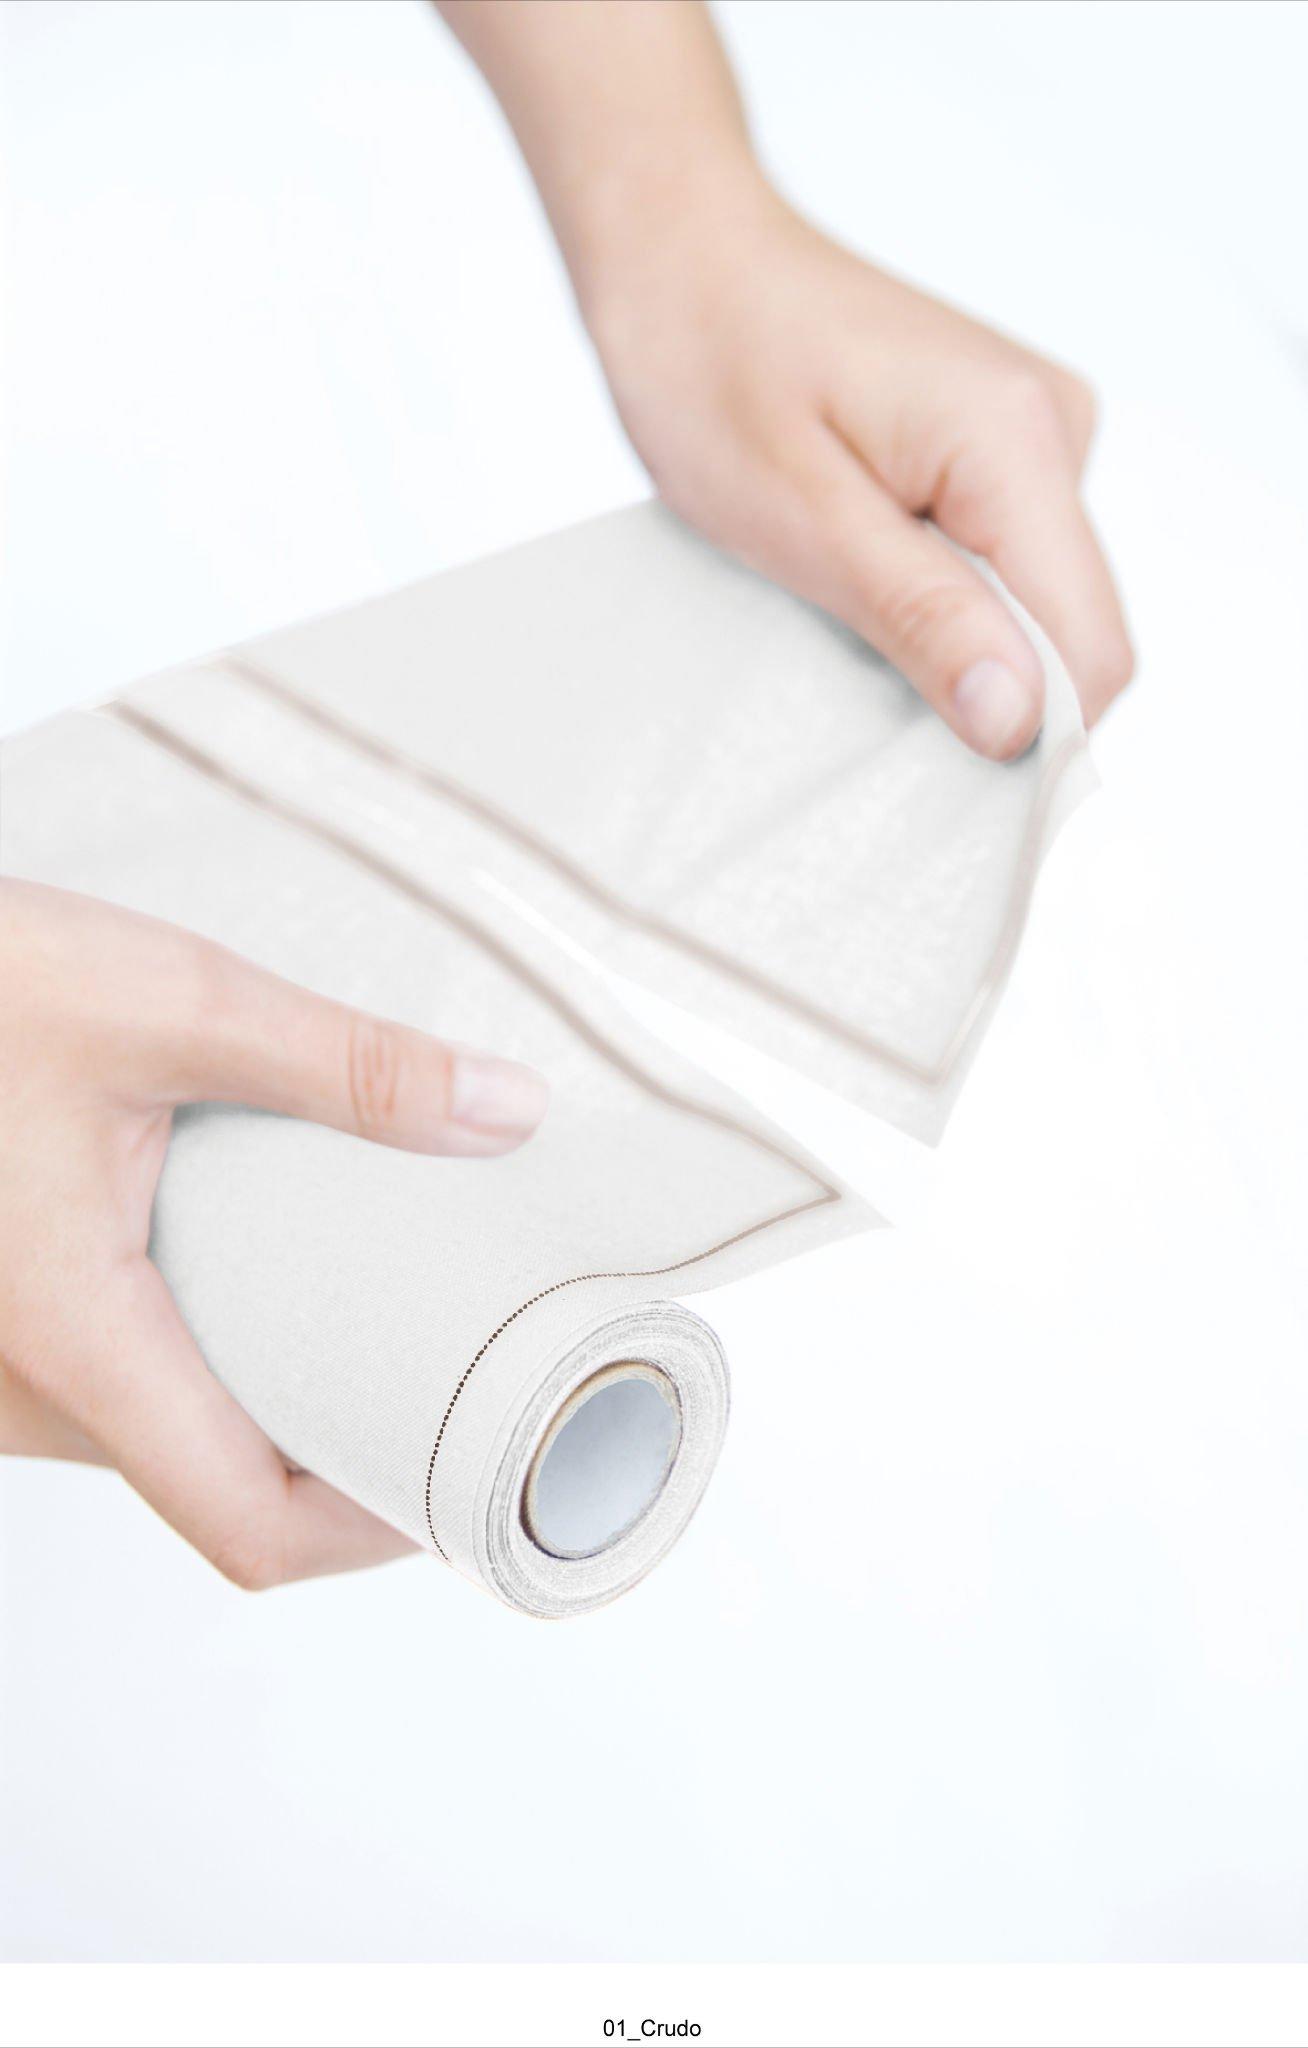 Cotton Dinner Napkin - 12.6 x 12.6 in - 12 units per roll - Ecru by MYdrap (Image #6)